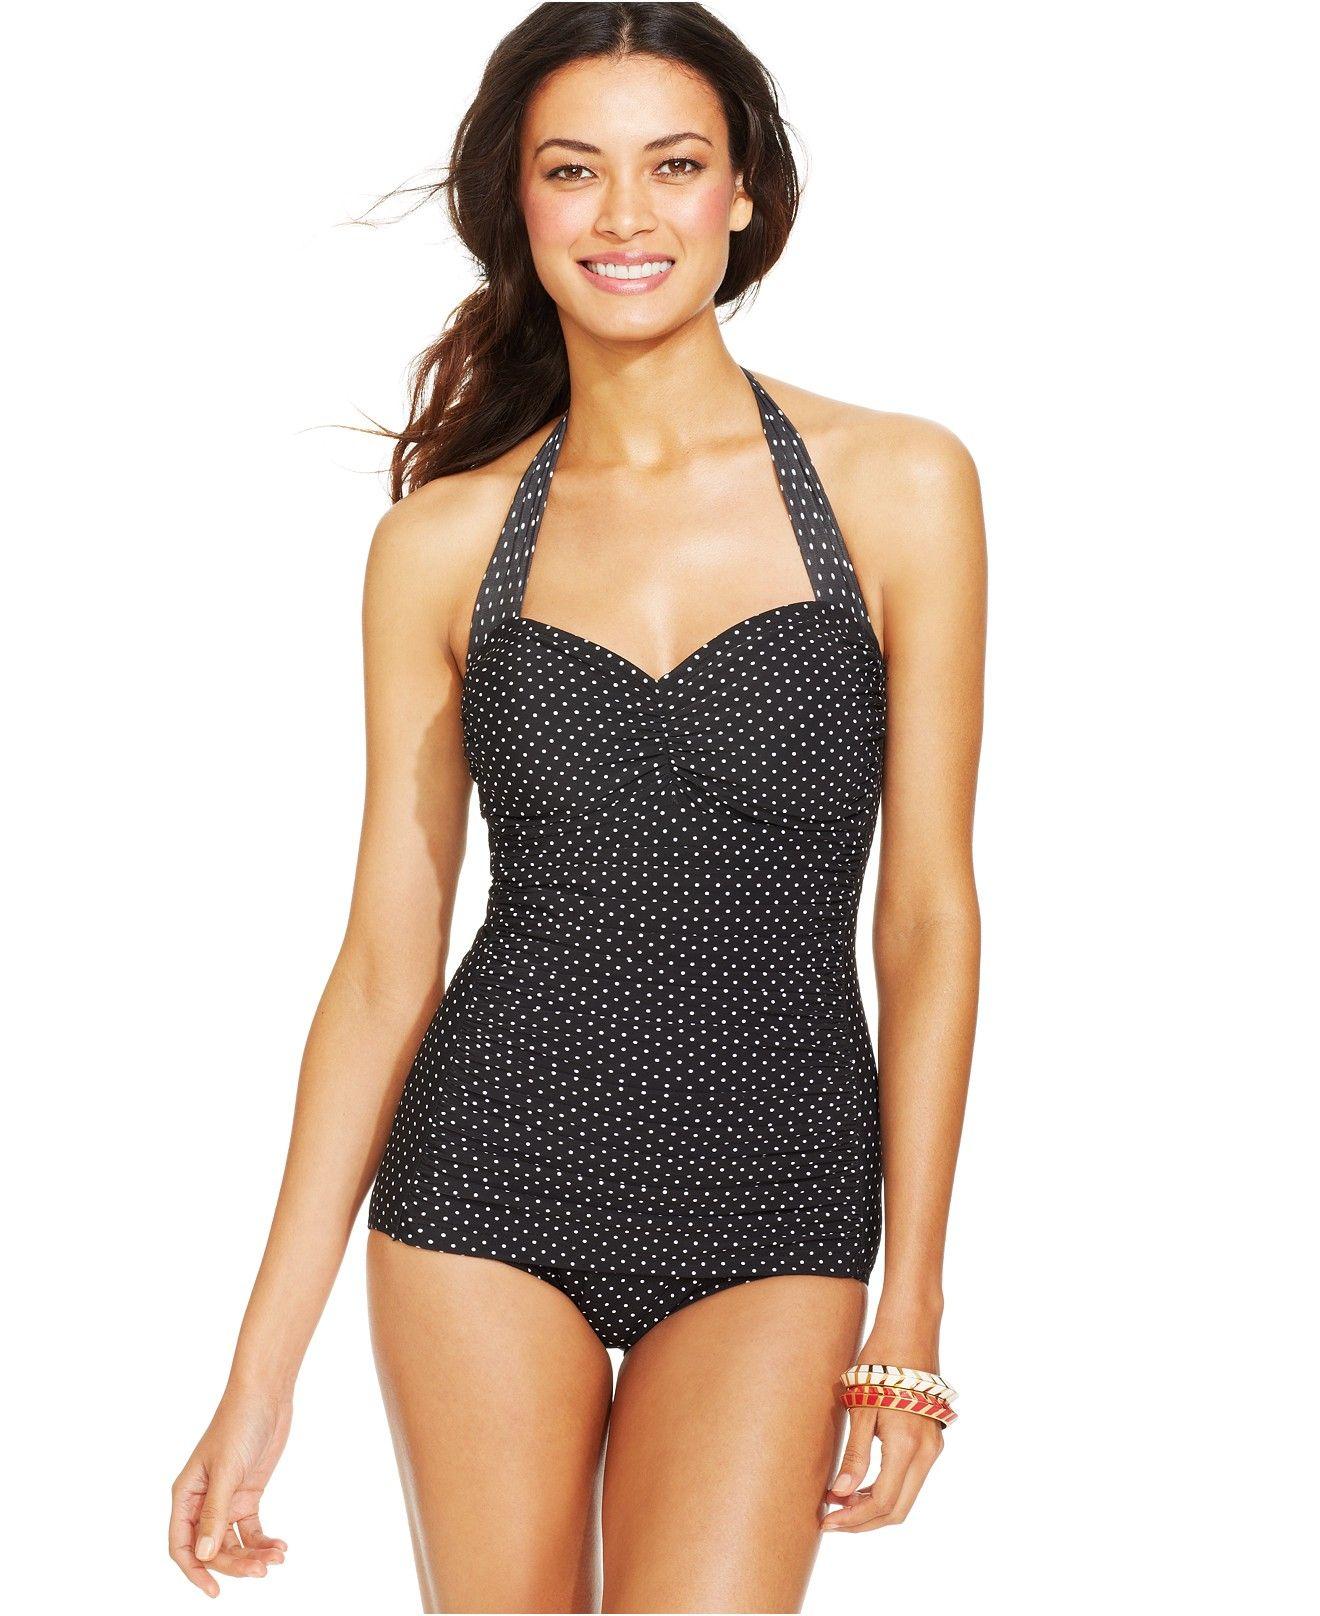 03da574f70b1e Miraclesuit Spellbound Polka-Dot Halter One-Piece Swimsuit - Swimwear -  Women - Macy's